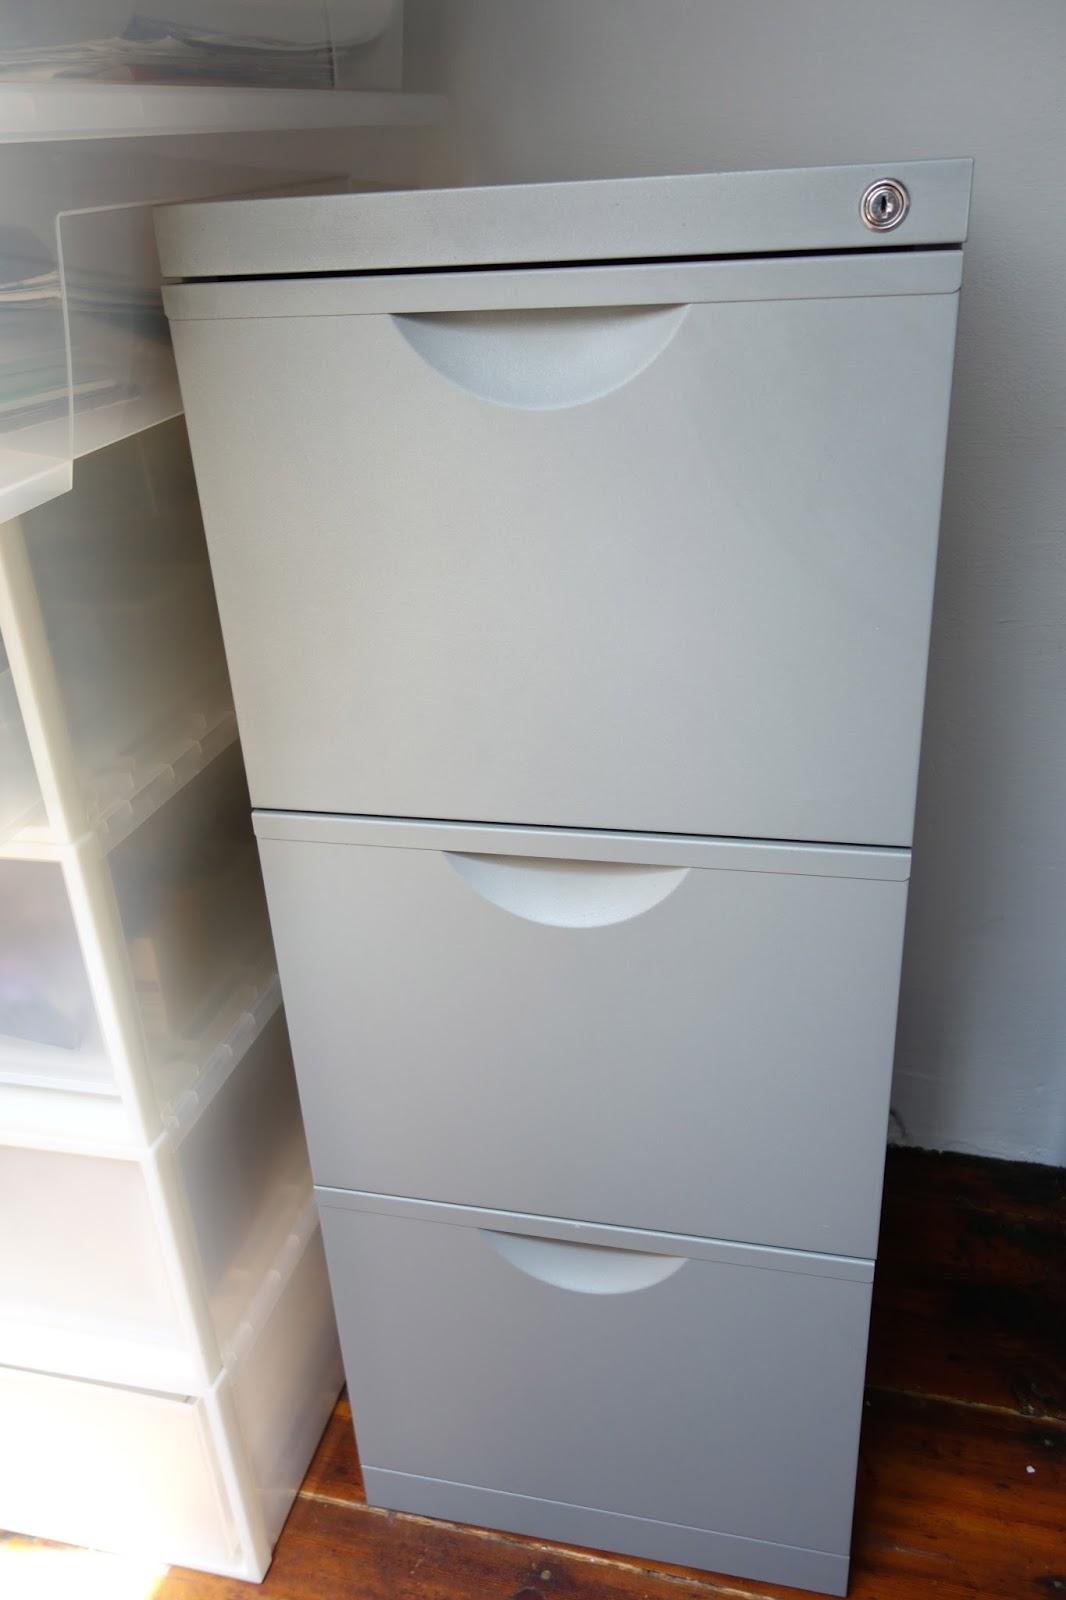 Ikea u0027Eriku0027 3 drawer filing cabinet - 16 1/8  x 41  & FOR SALE - HOUSING ITEMS: Ikea u0027Eriku0027 3 drawer filing cabinet - 16 1 ...